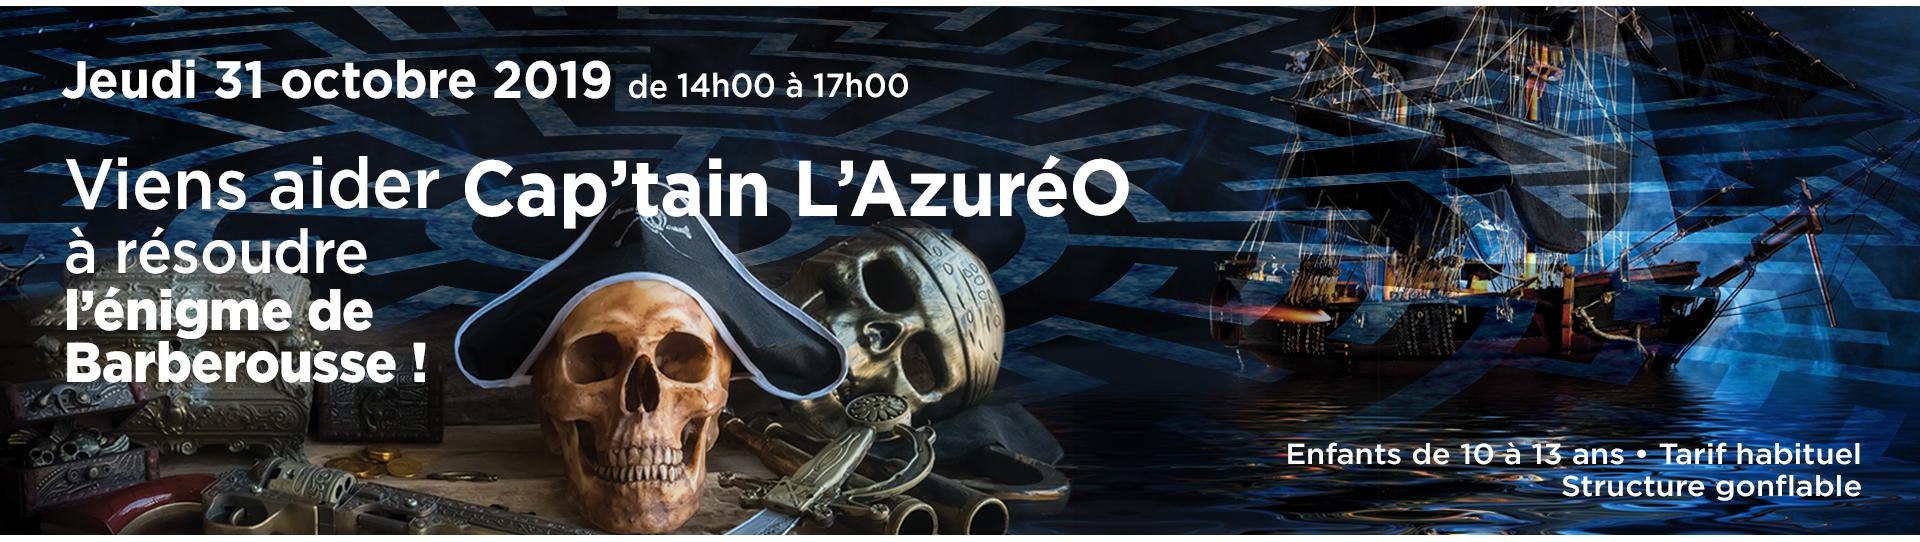 Viens aider Cap'tain L'Azuréo